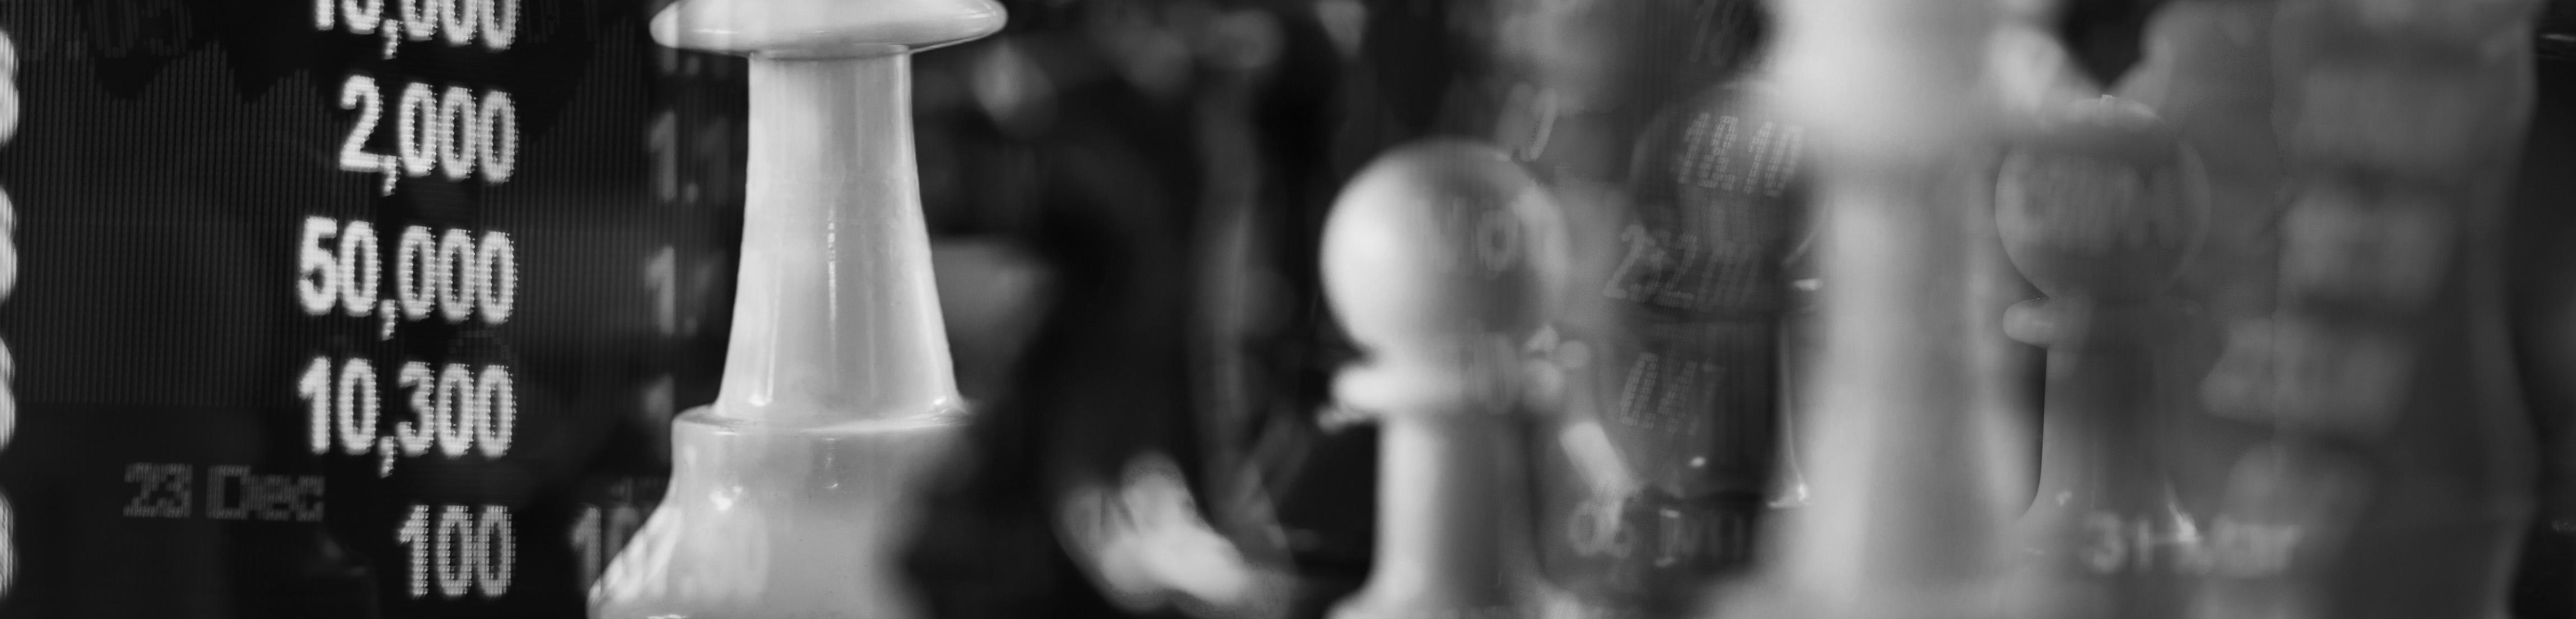 Chessmetrics